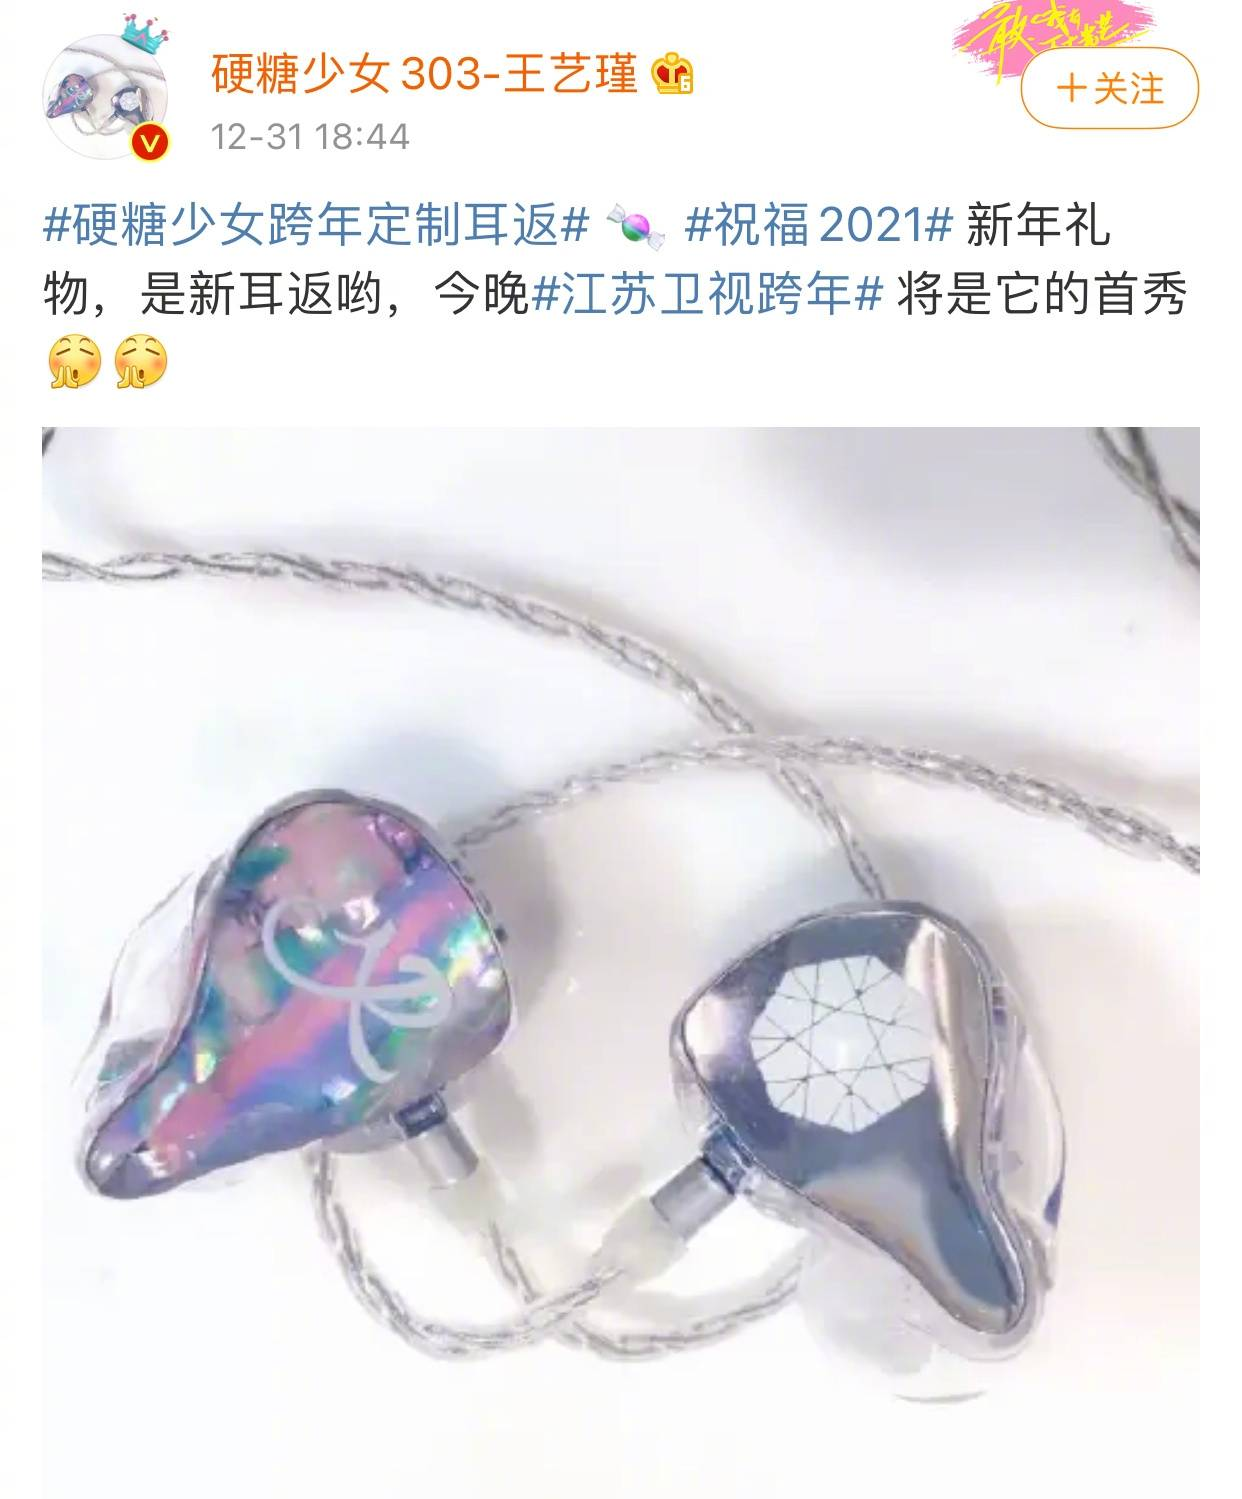 od: 硬糖少女跨年定制耳返